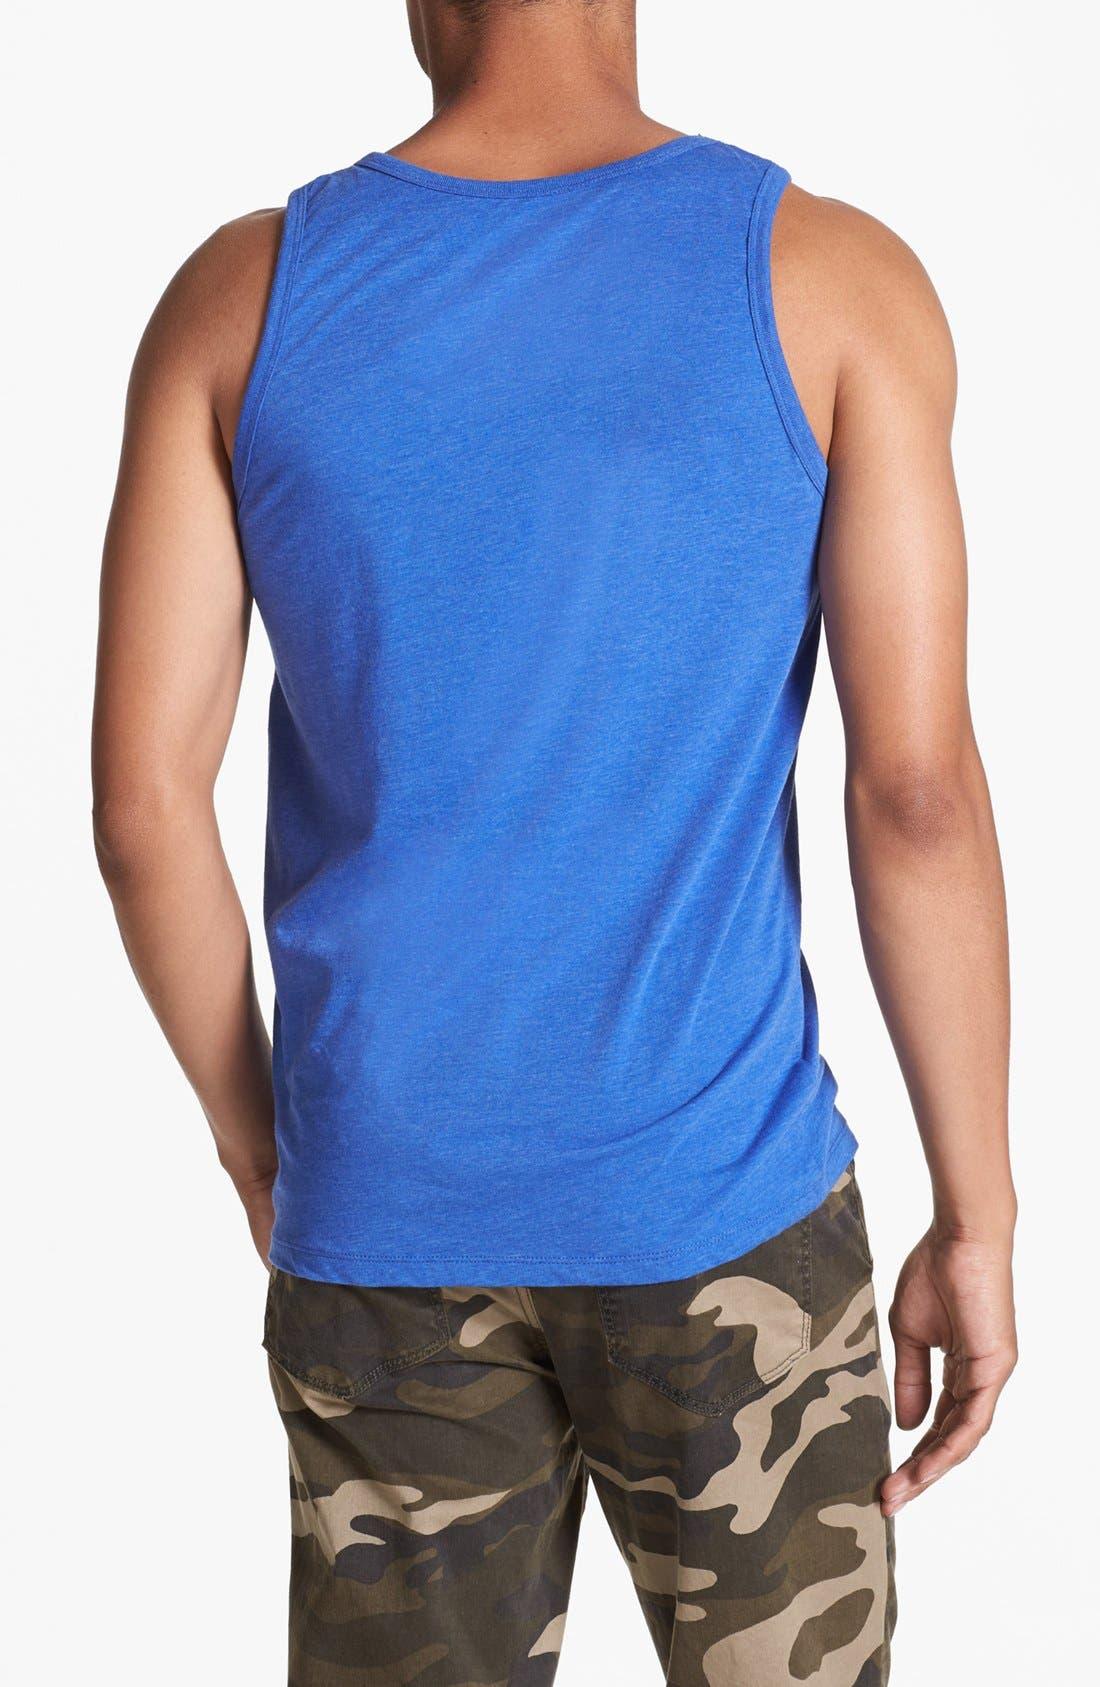 Alternate Image 2  - Headline Shirt 'Captain Merica' Tank Top